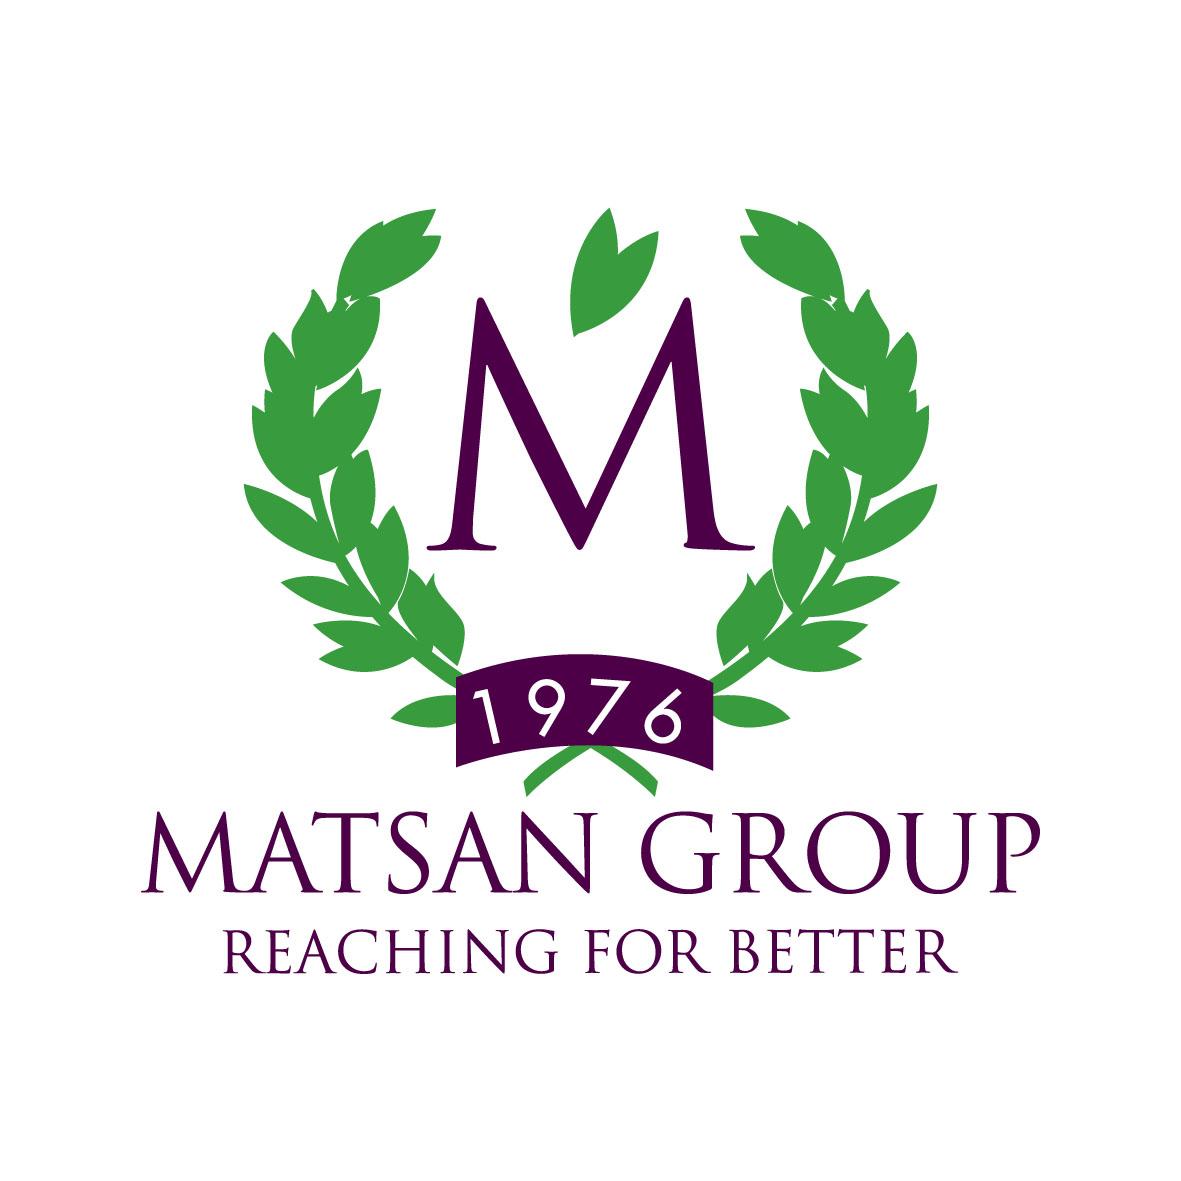 Matsan ilac Sanayi Ltd Sti, Matsan Group